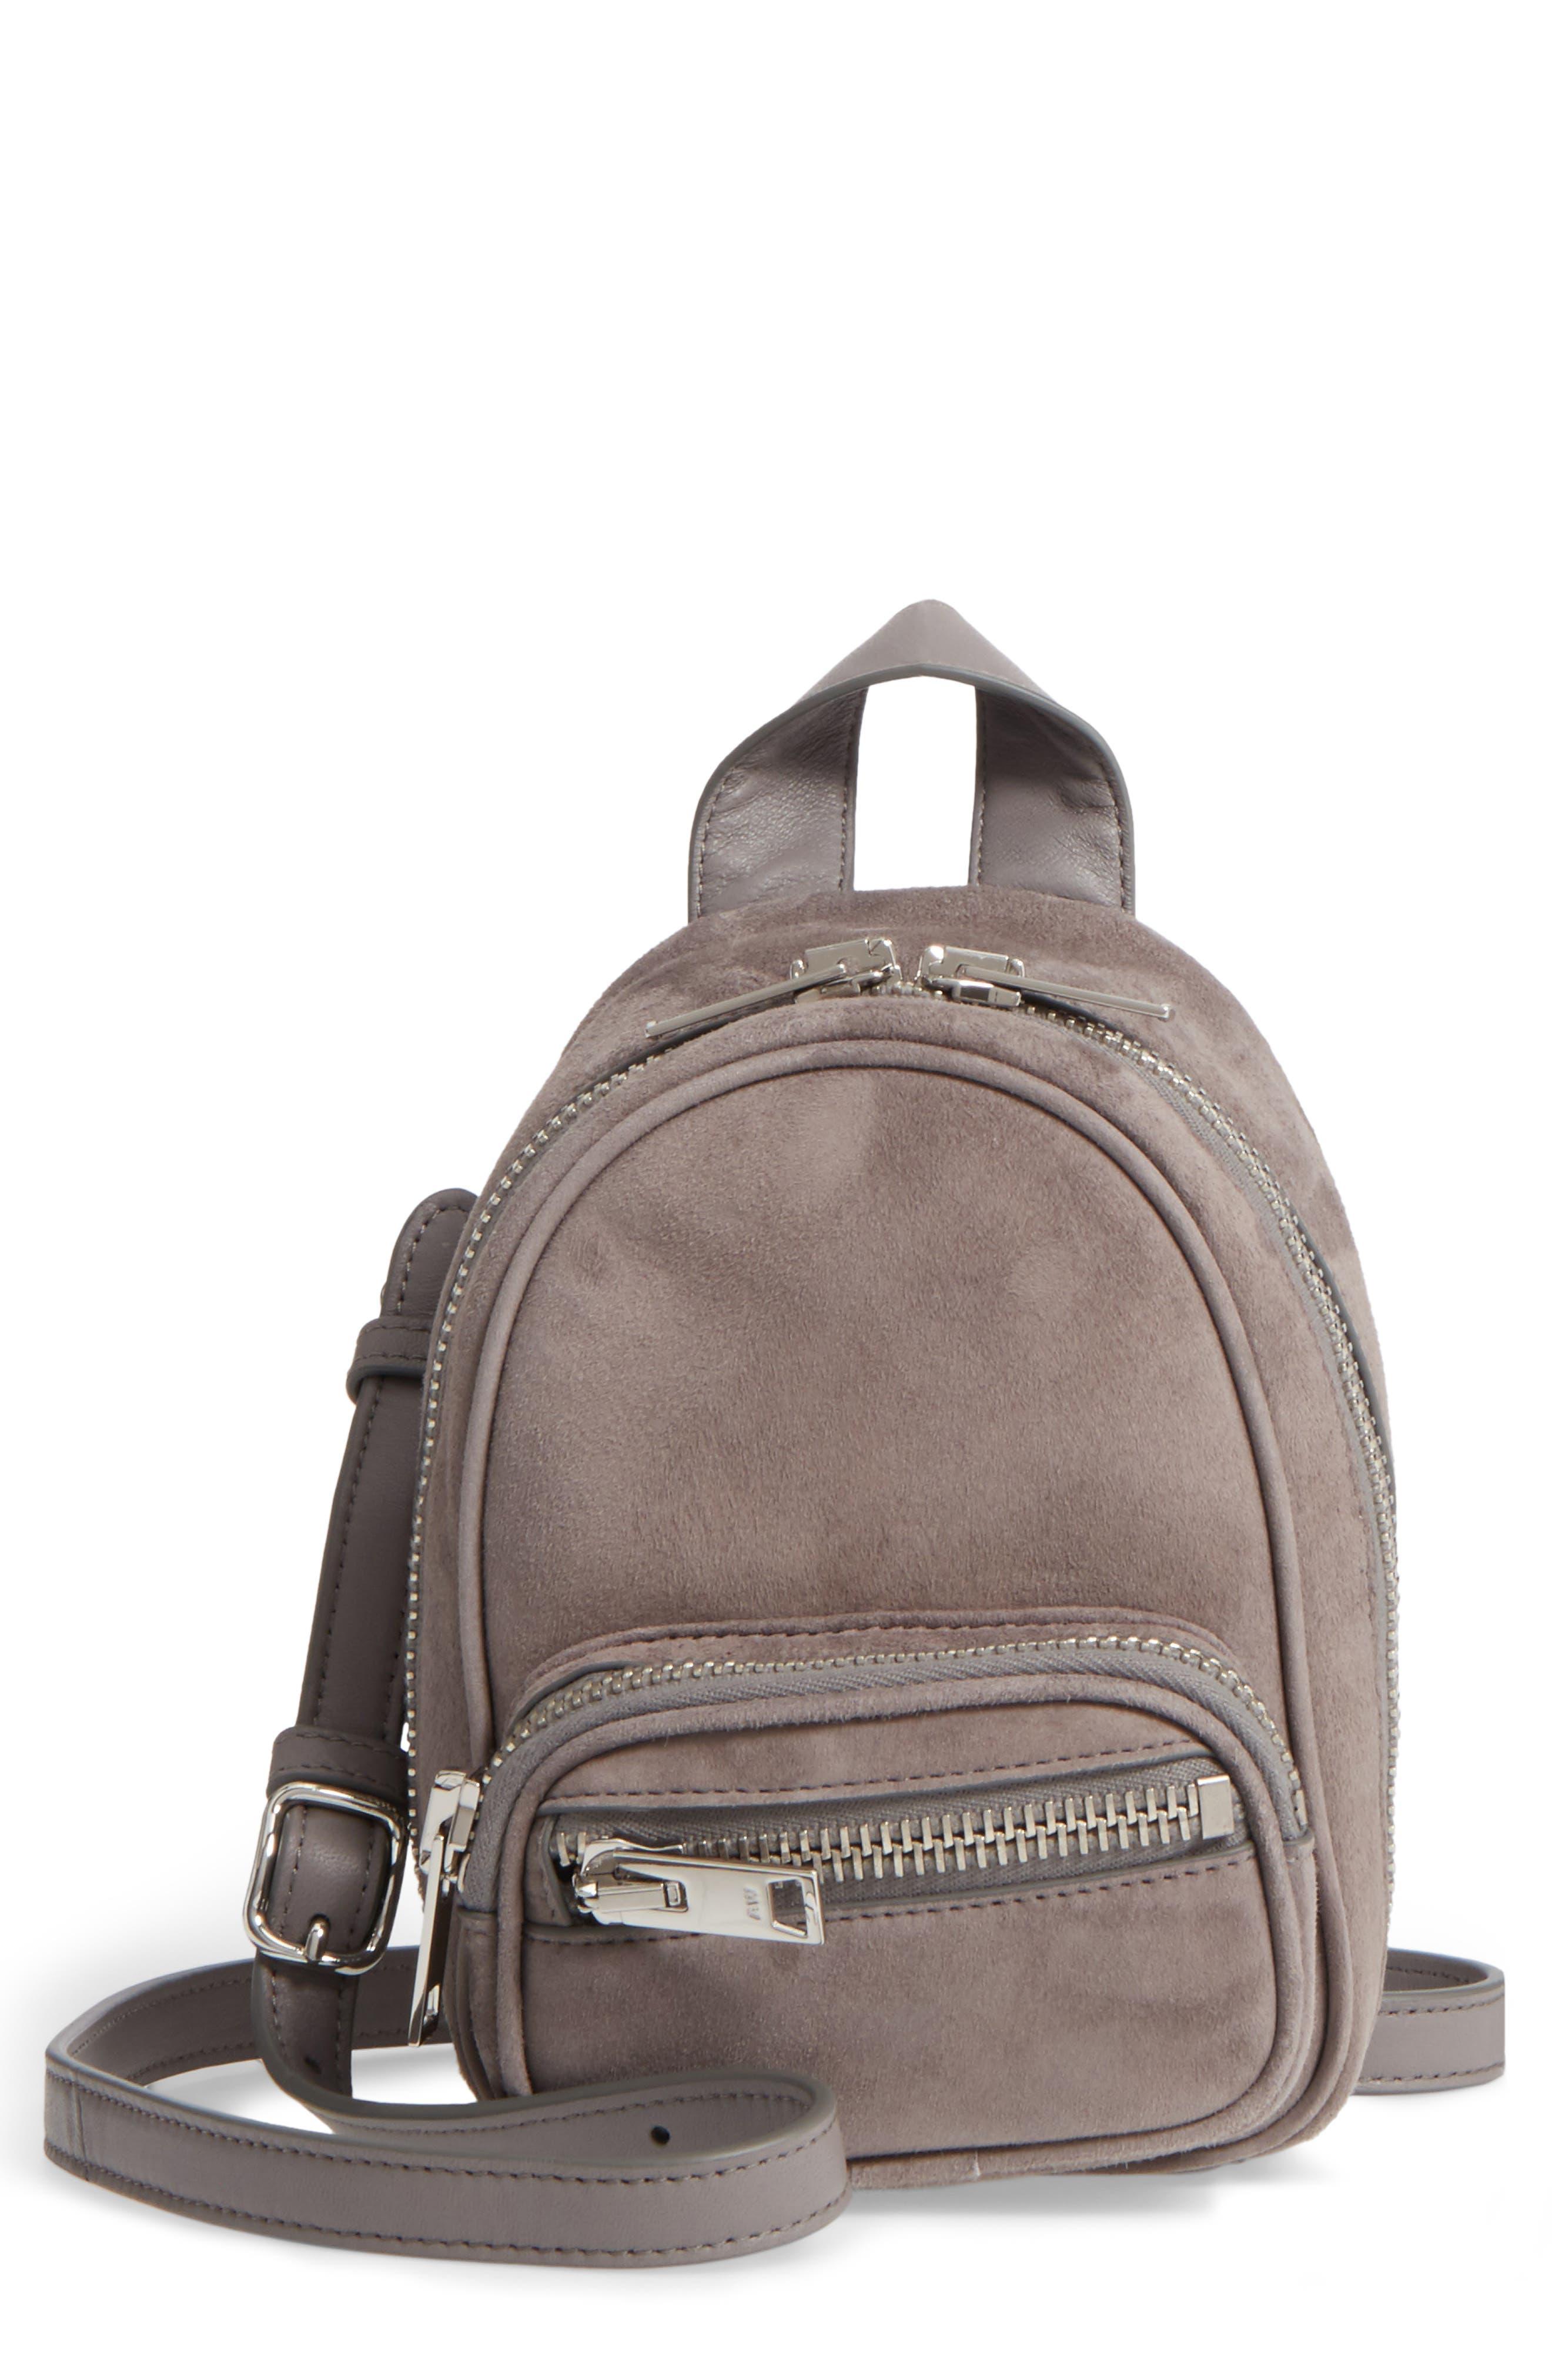 Mini Attica Leather Crossbody Backpack,                             Main thumbnail 1, color,                             080